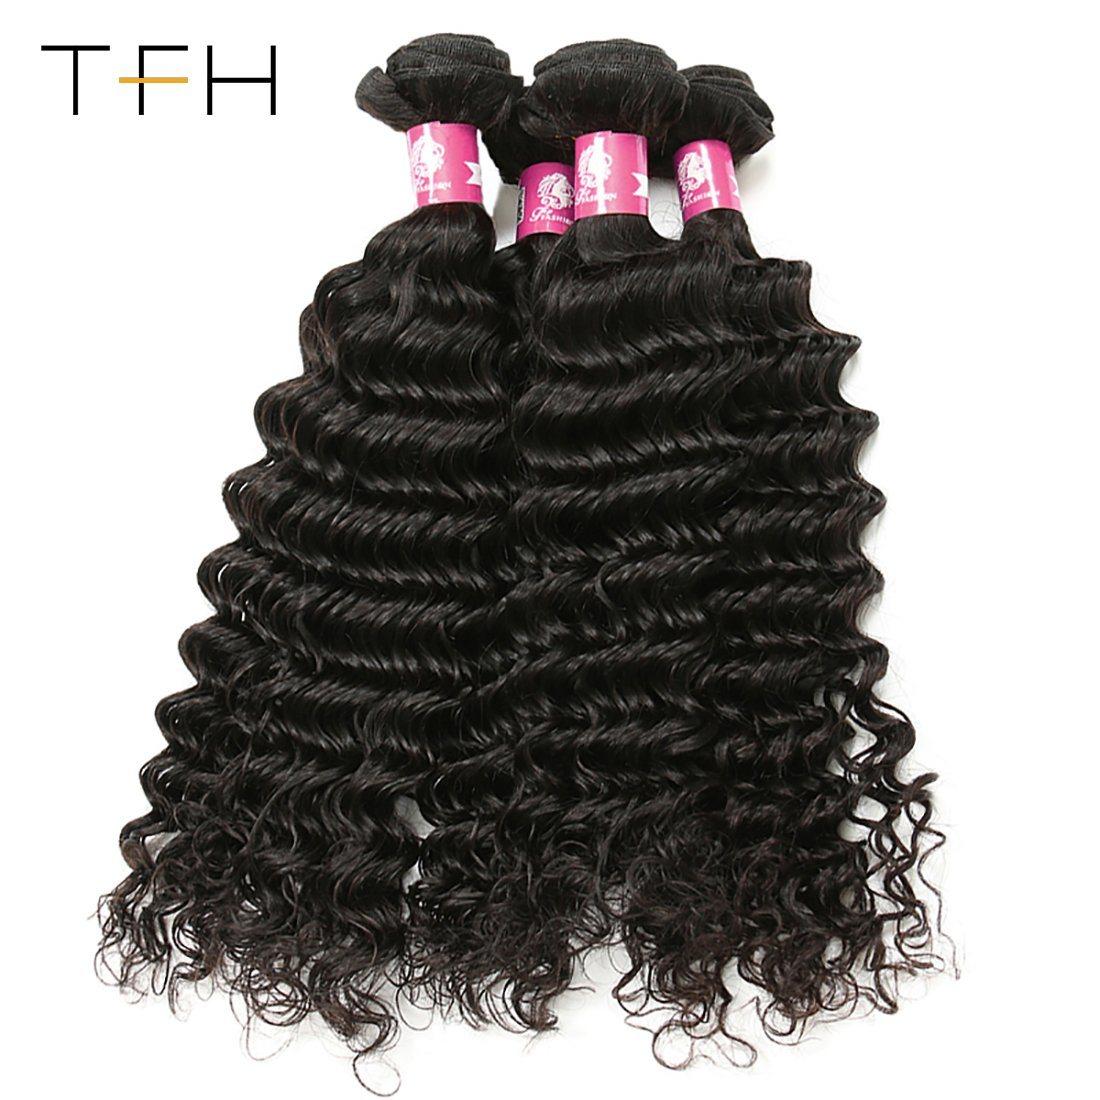 China Cheep Wholesale 100 Brazilian Virgin Remy Human Hair Weave